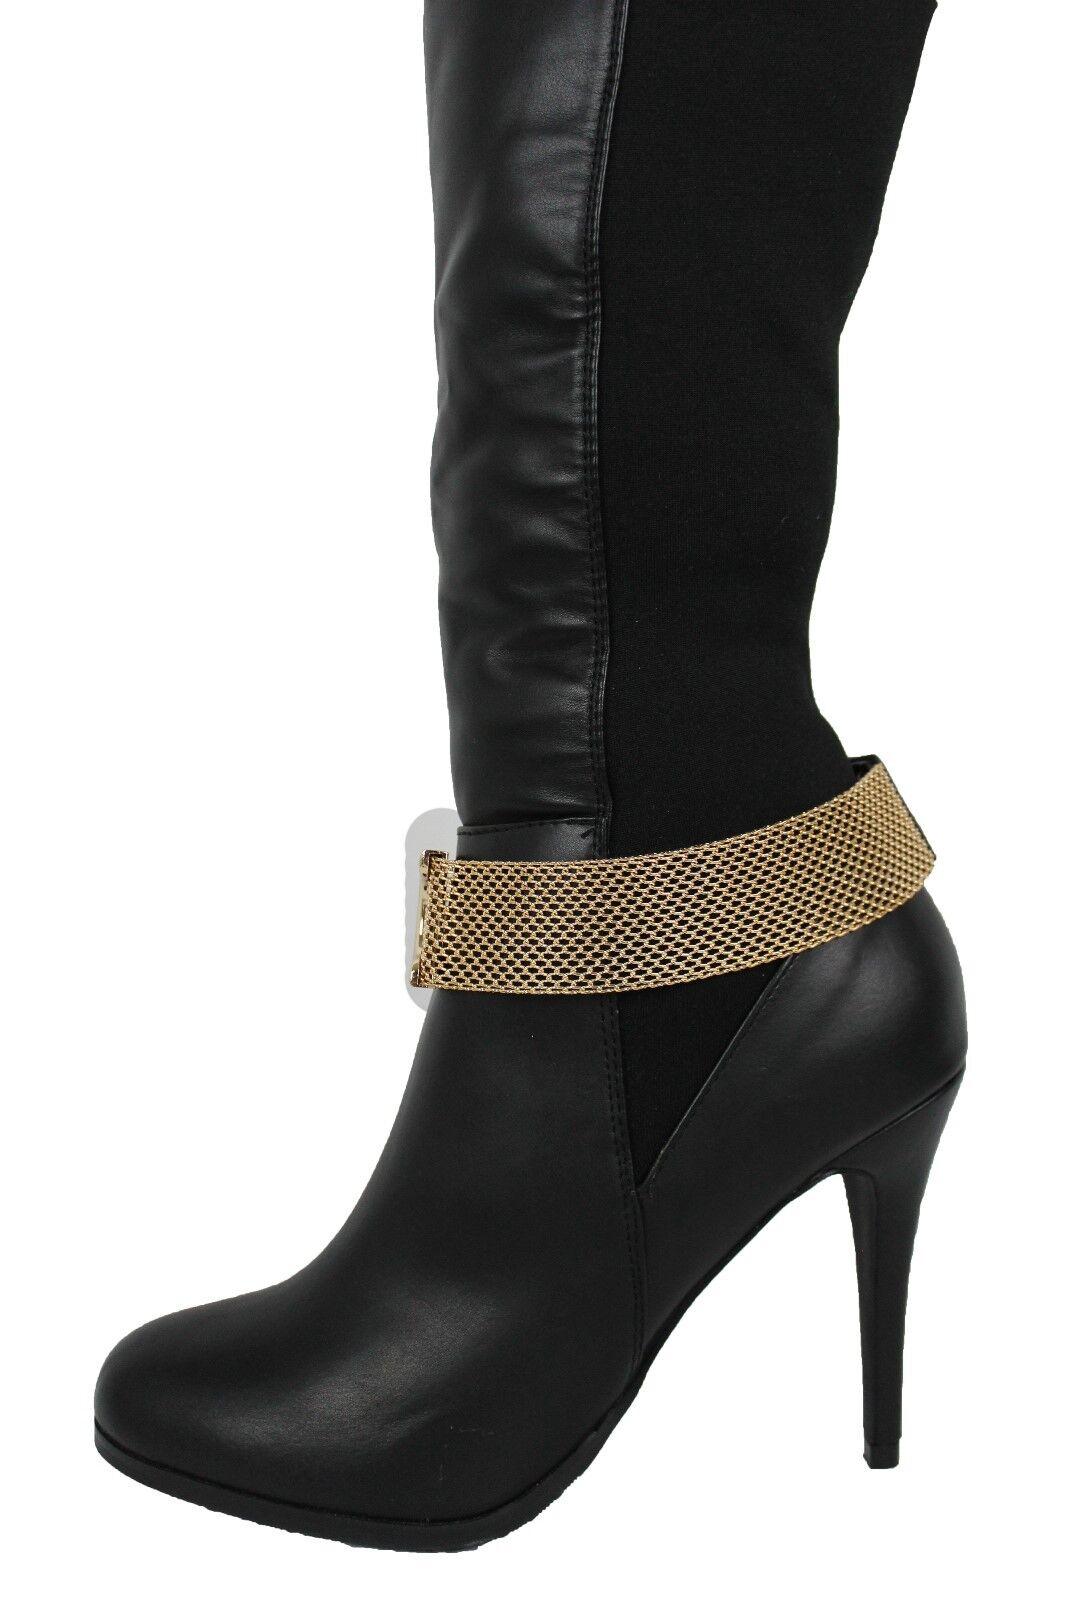 Women Western Boot Bracelet Gold Mesh Metal Chain Shoe Anklet Bling Strap Charm